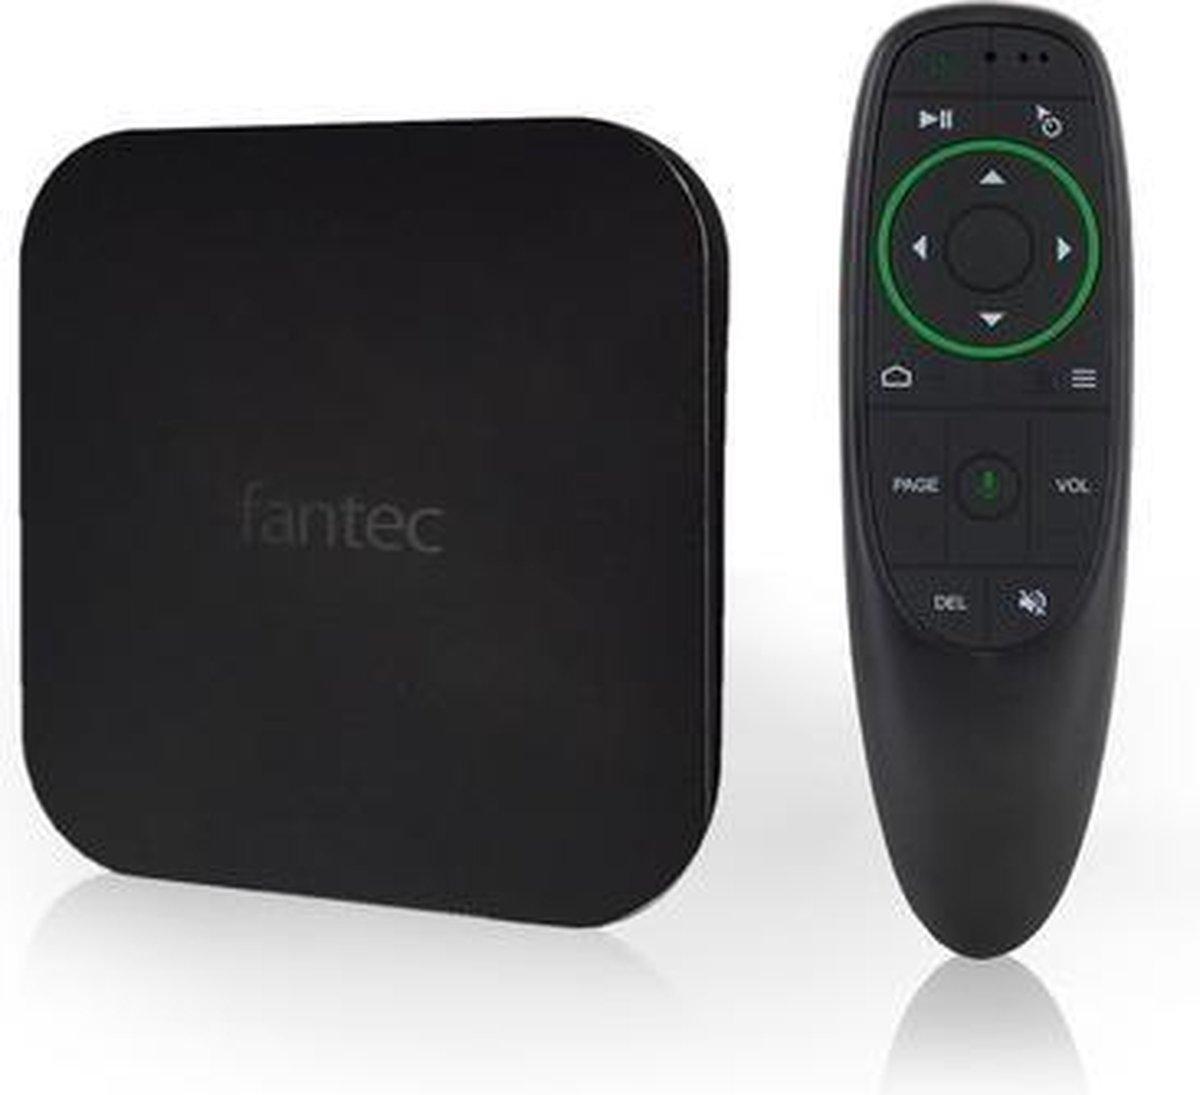 Fantec 4KS7700Air digitale mediaspeler 16 GB 4K Ultra HD 3840 x 2160 Pixels Wi-Fi Zwart